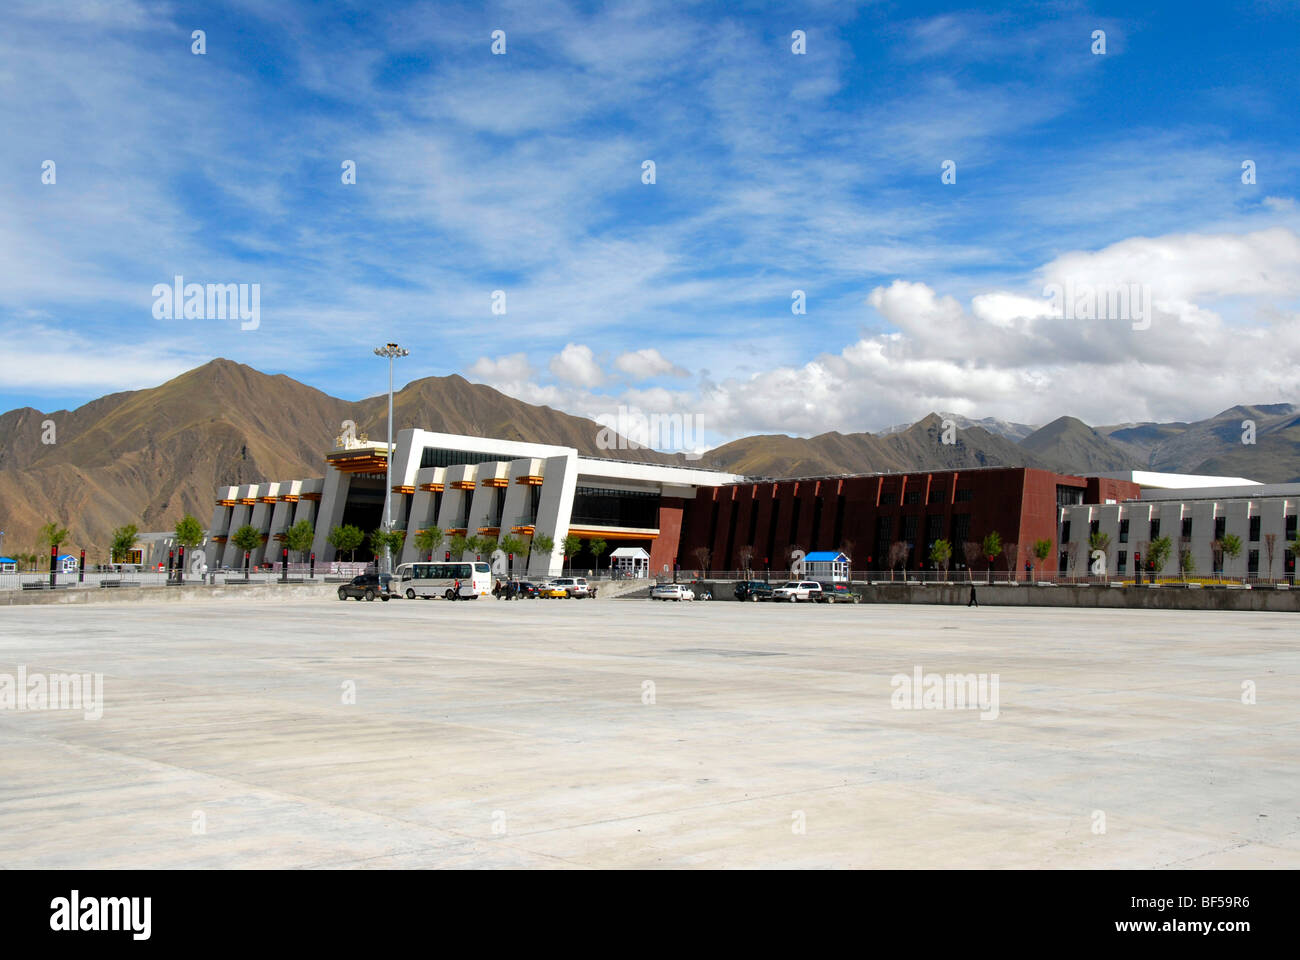 Modern Tibetan architecture, railway station in Lhasa, Himalayas, Tibet Autonomous Region, People's Republic - Stock Image